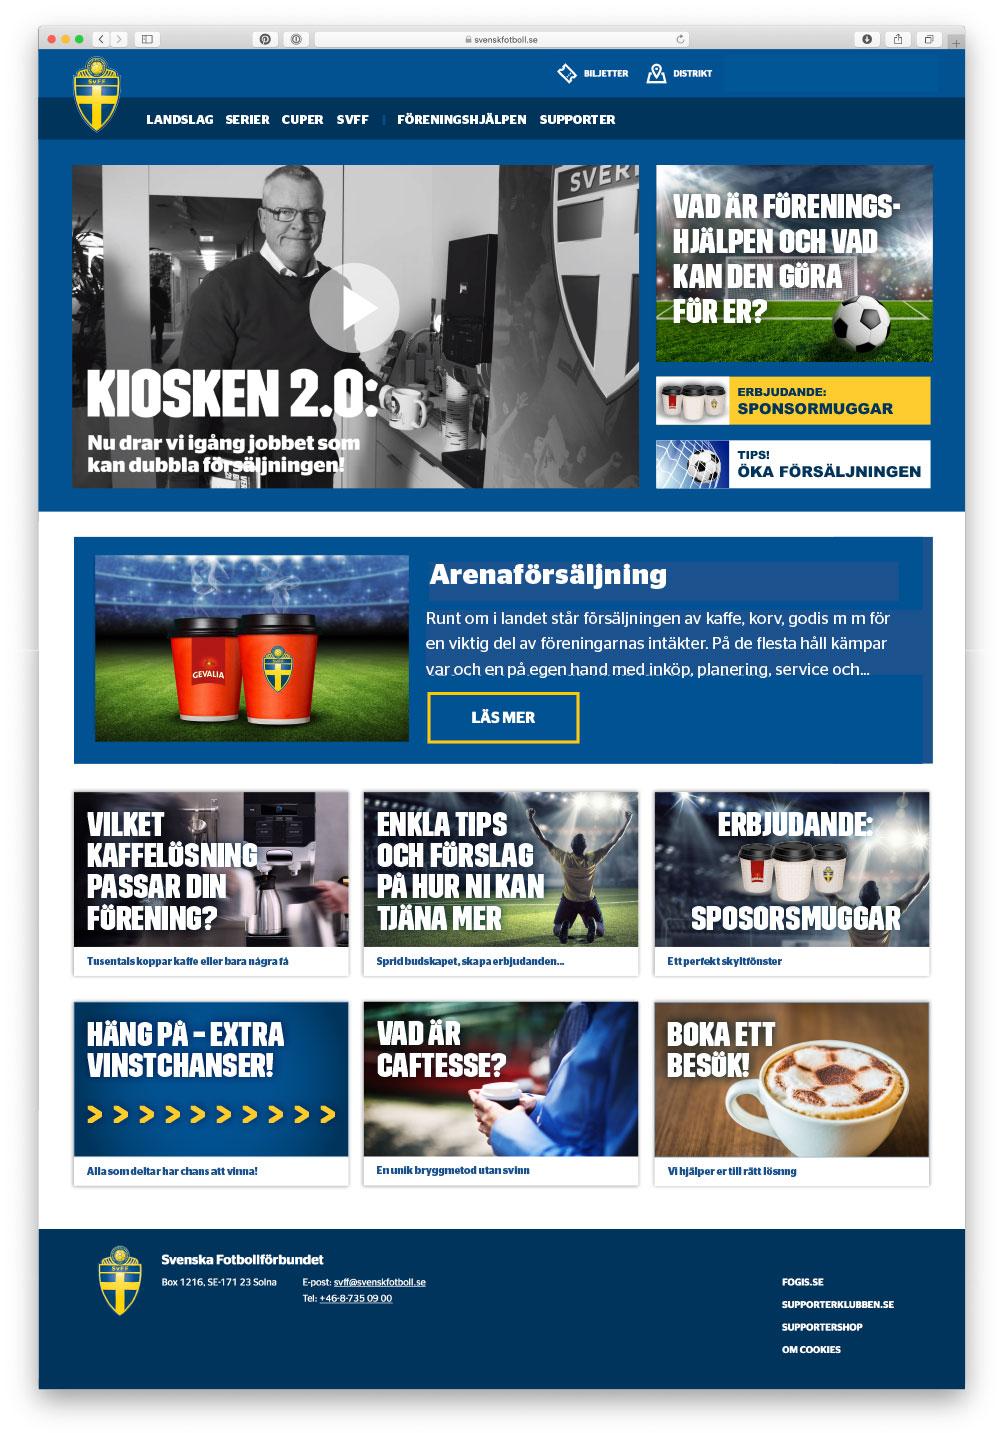 SvFF-Kiosken-2.0-sajt